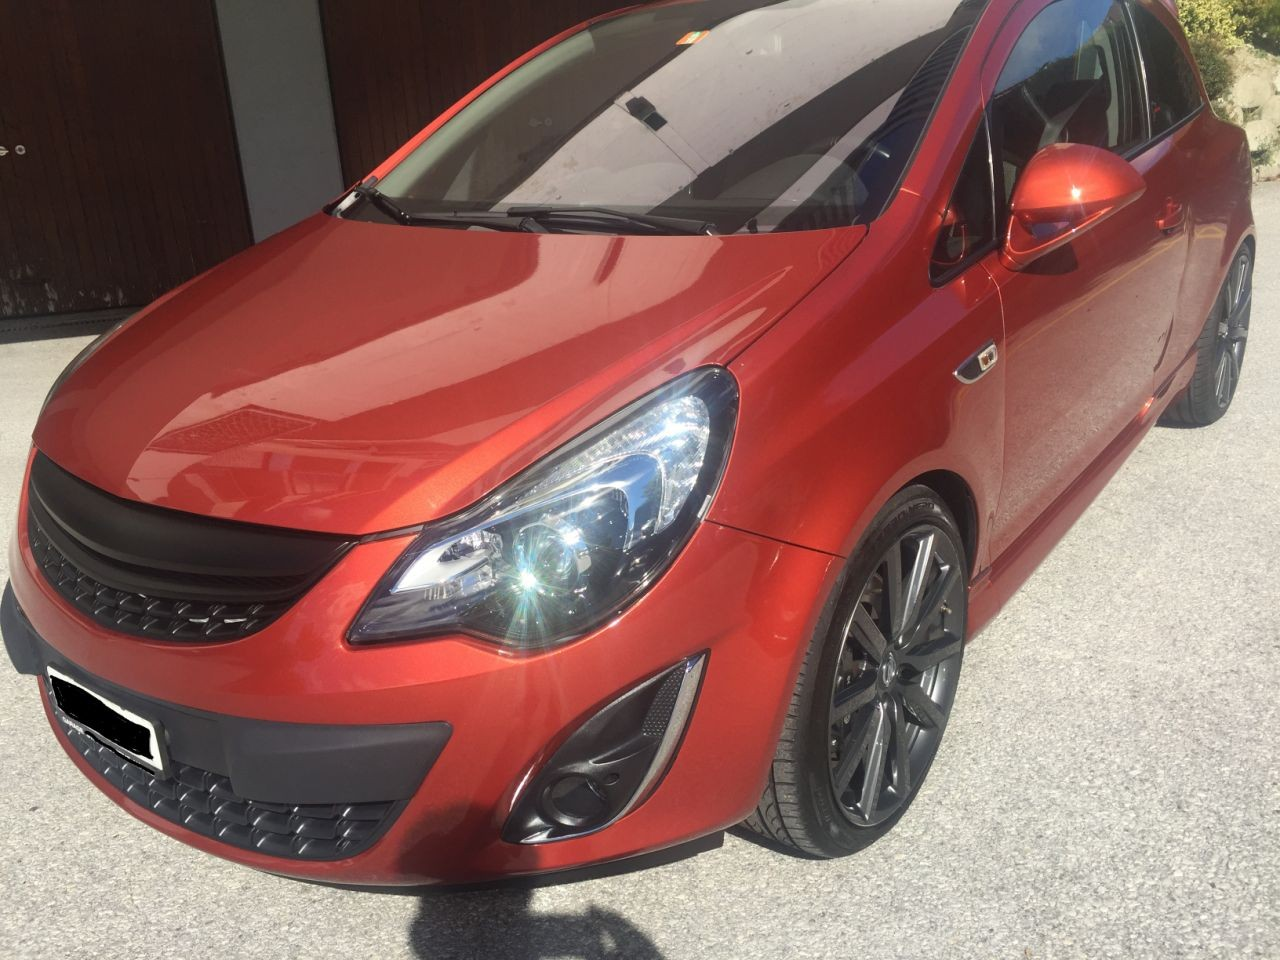 saloon Opel Corsa Nurburgring Edition